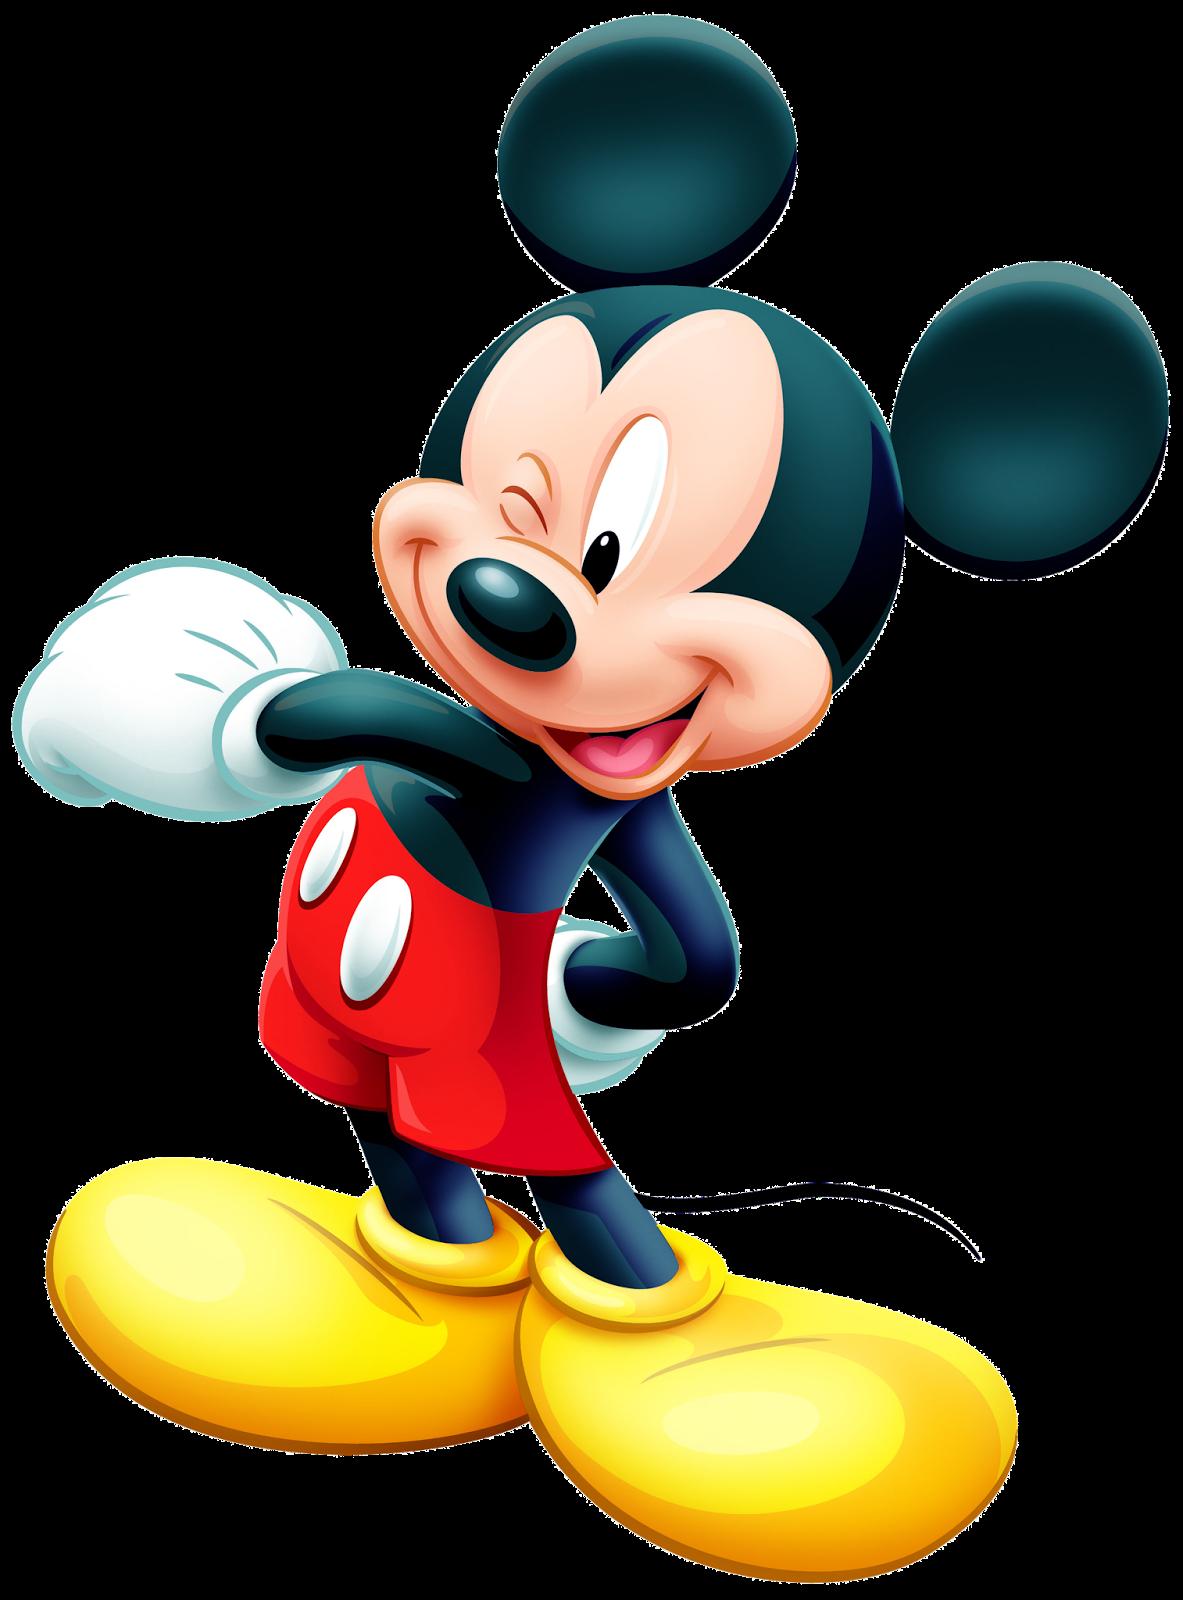 Mickey Mouse Acostado Png - Novocom.top